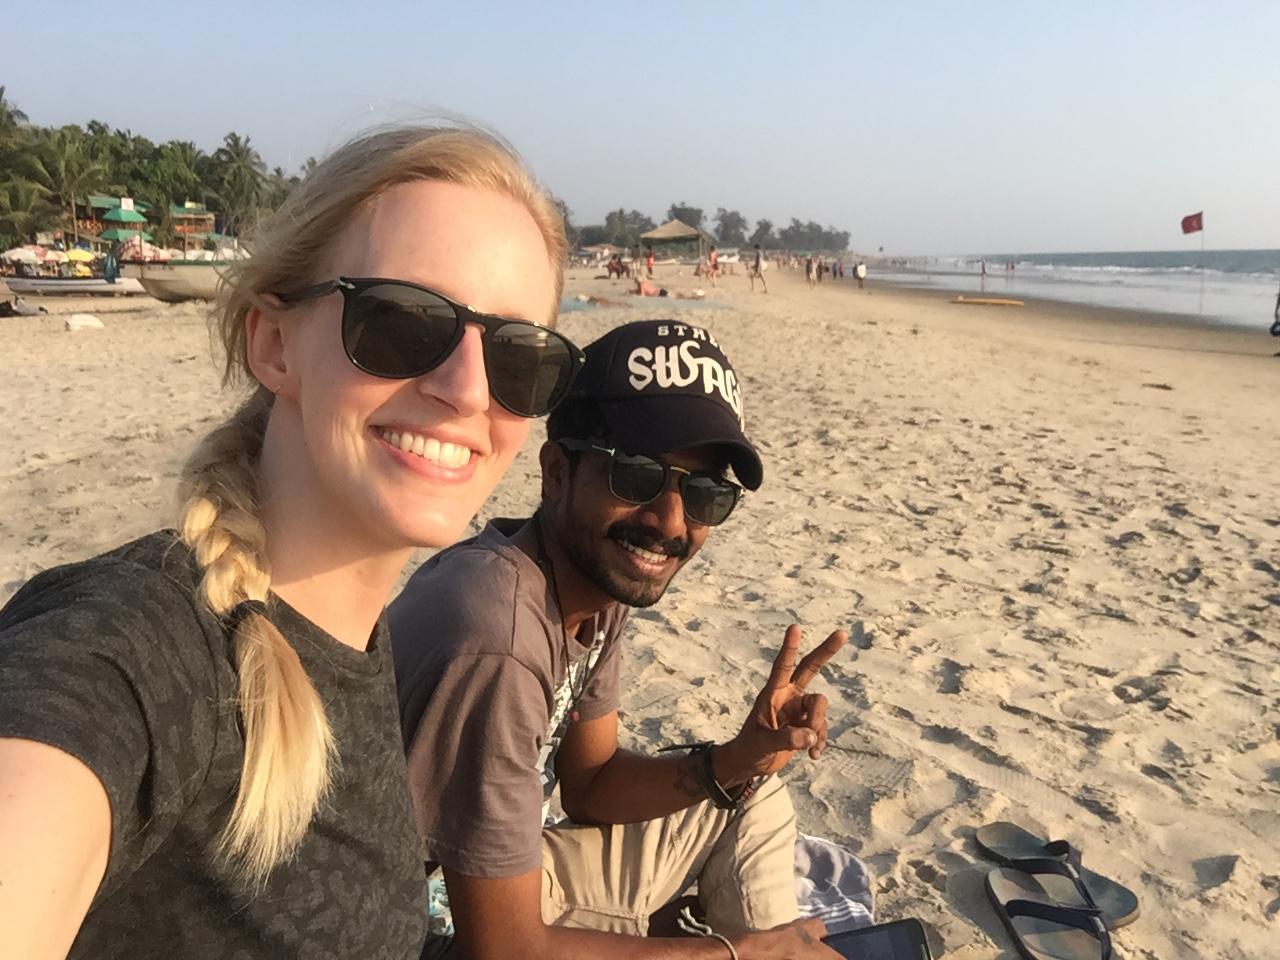 A selfie with my friend Rahul on the beach of Arambol, Goa